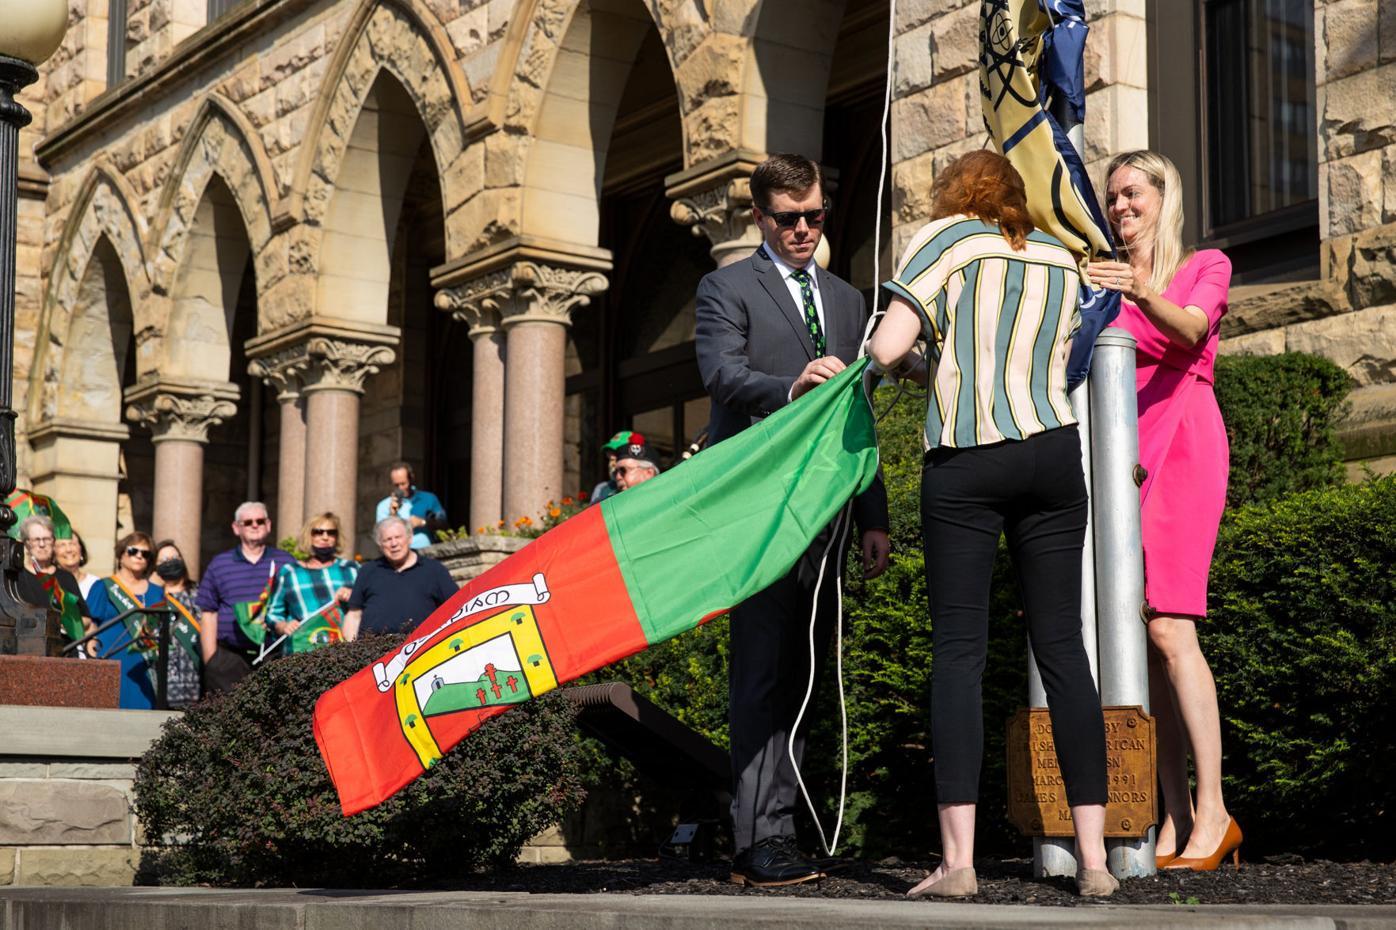 County Mayo Flag Raising at Scranton City Hall